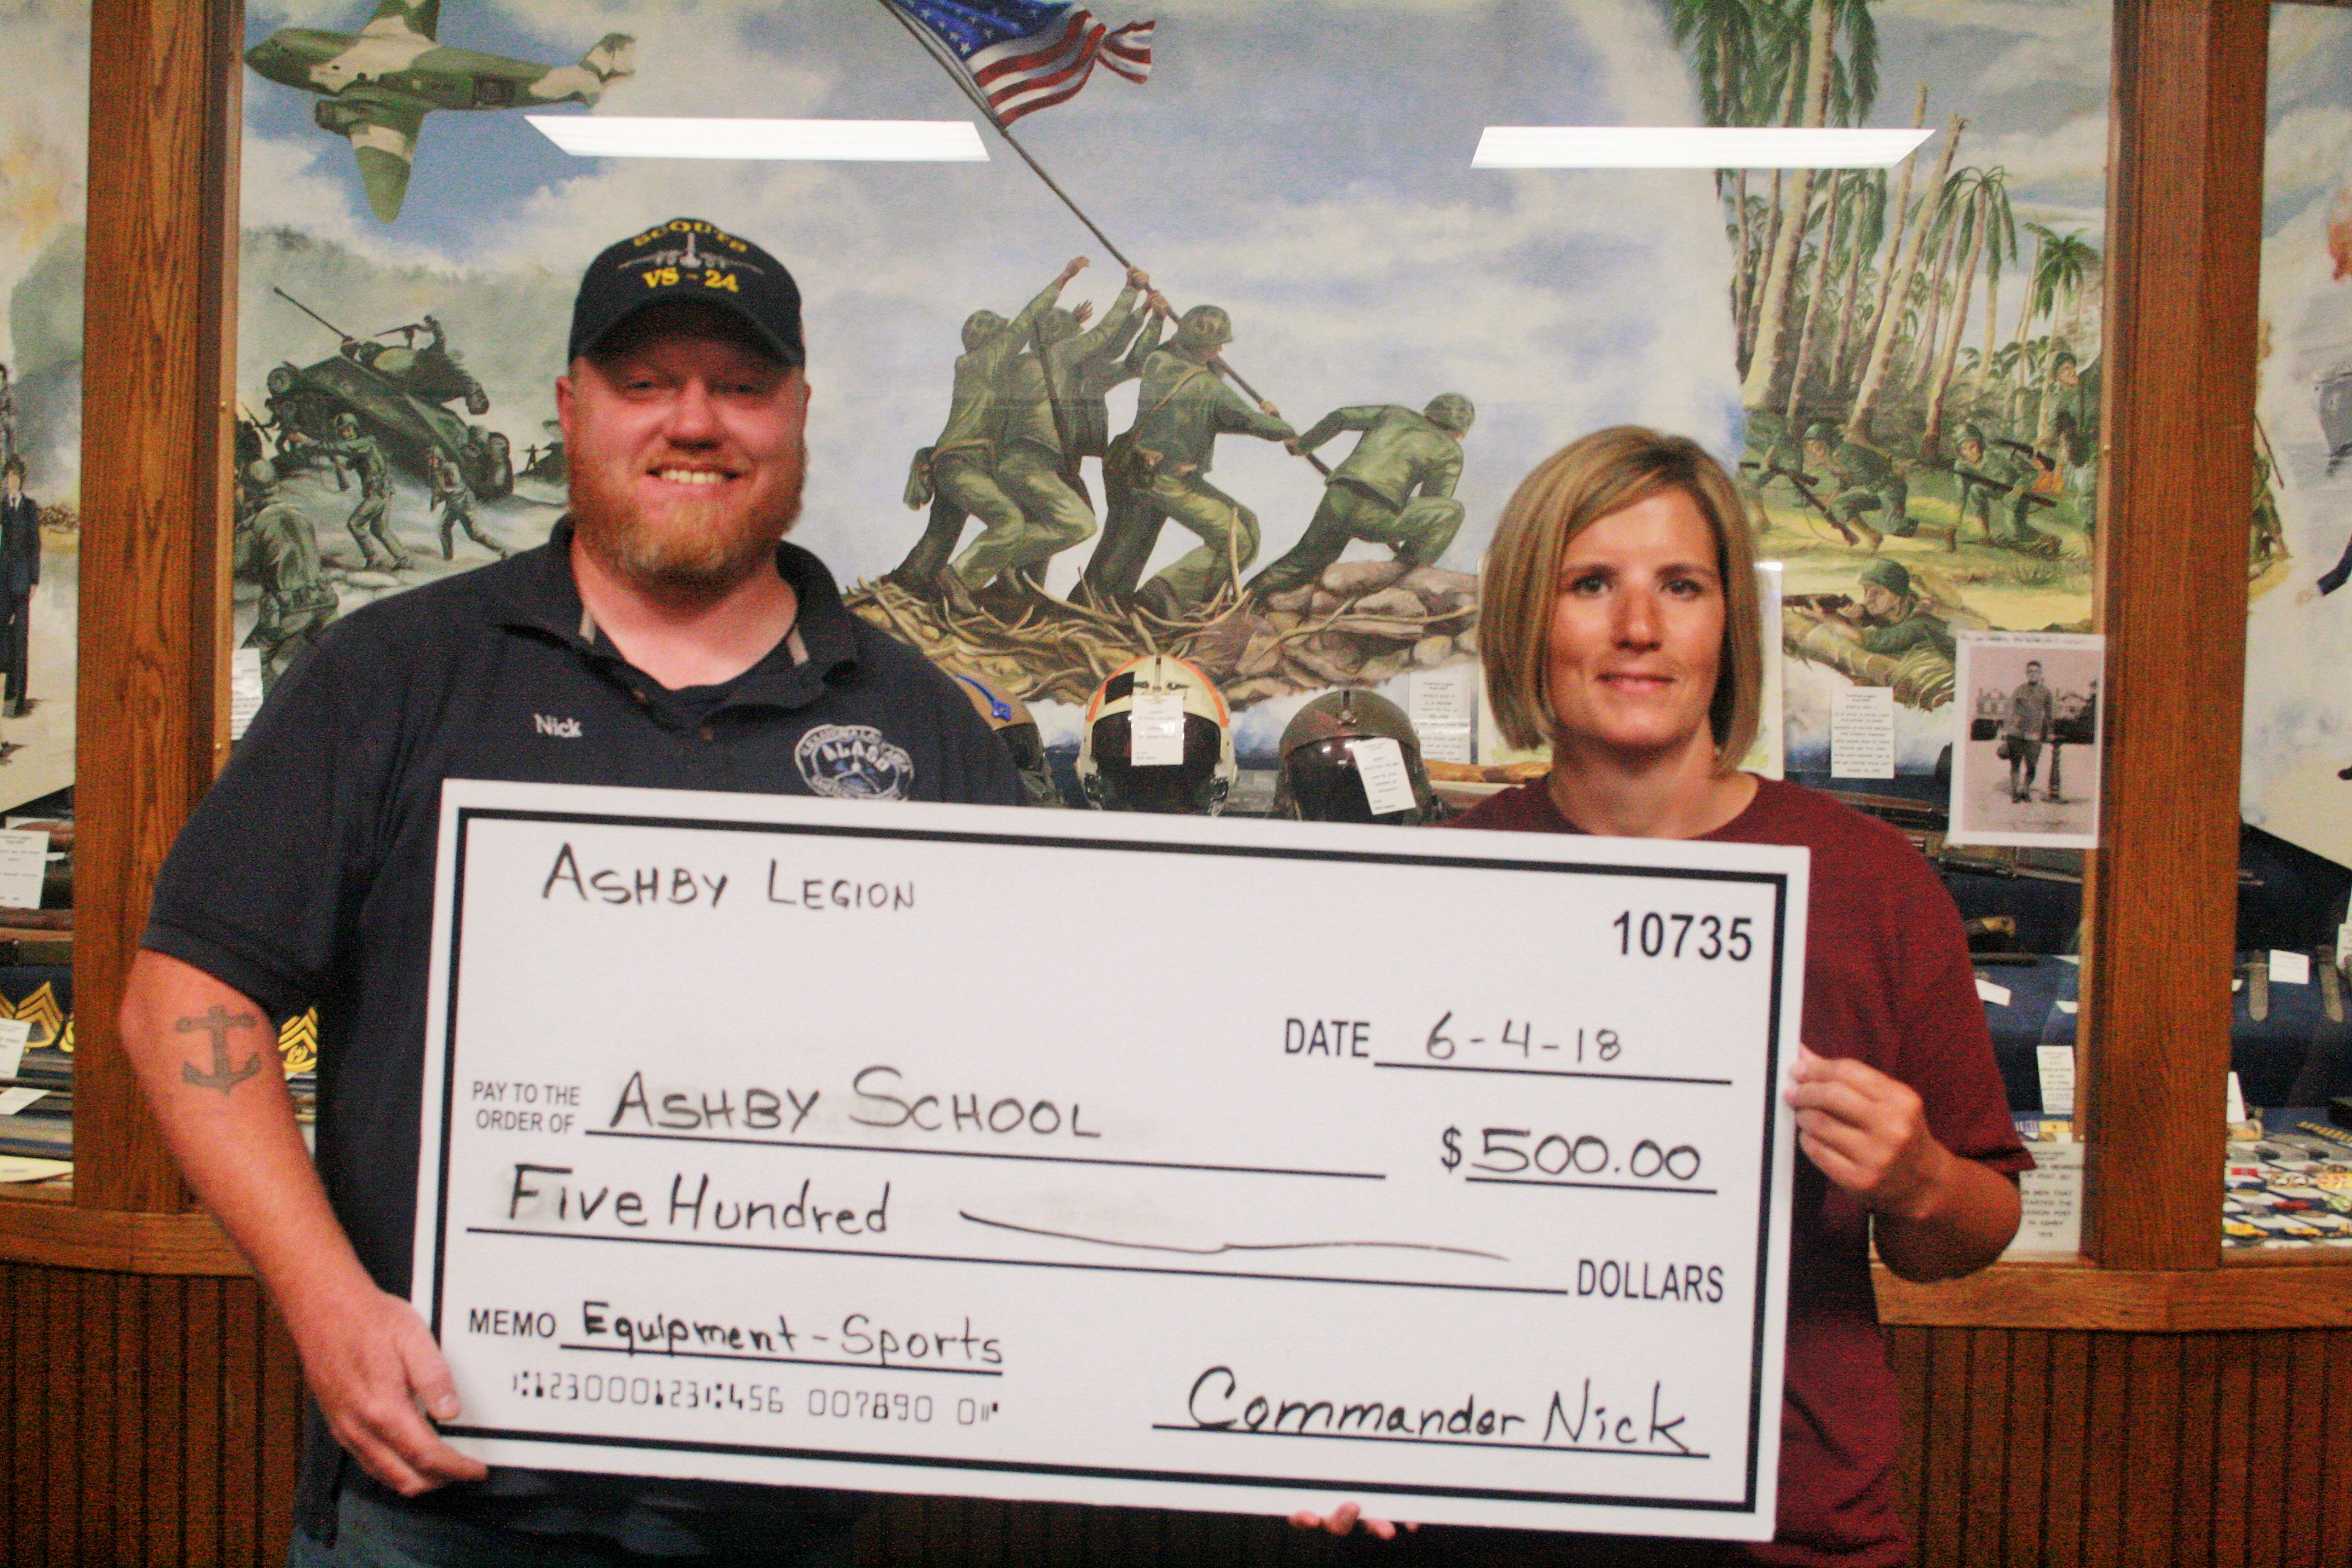 Ashby Legion Donates